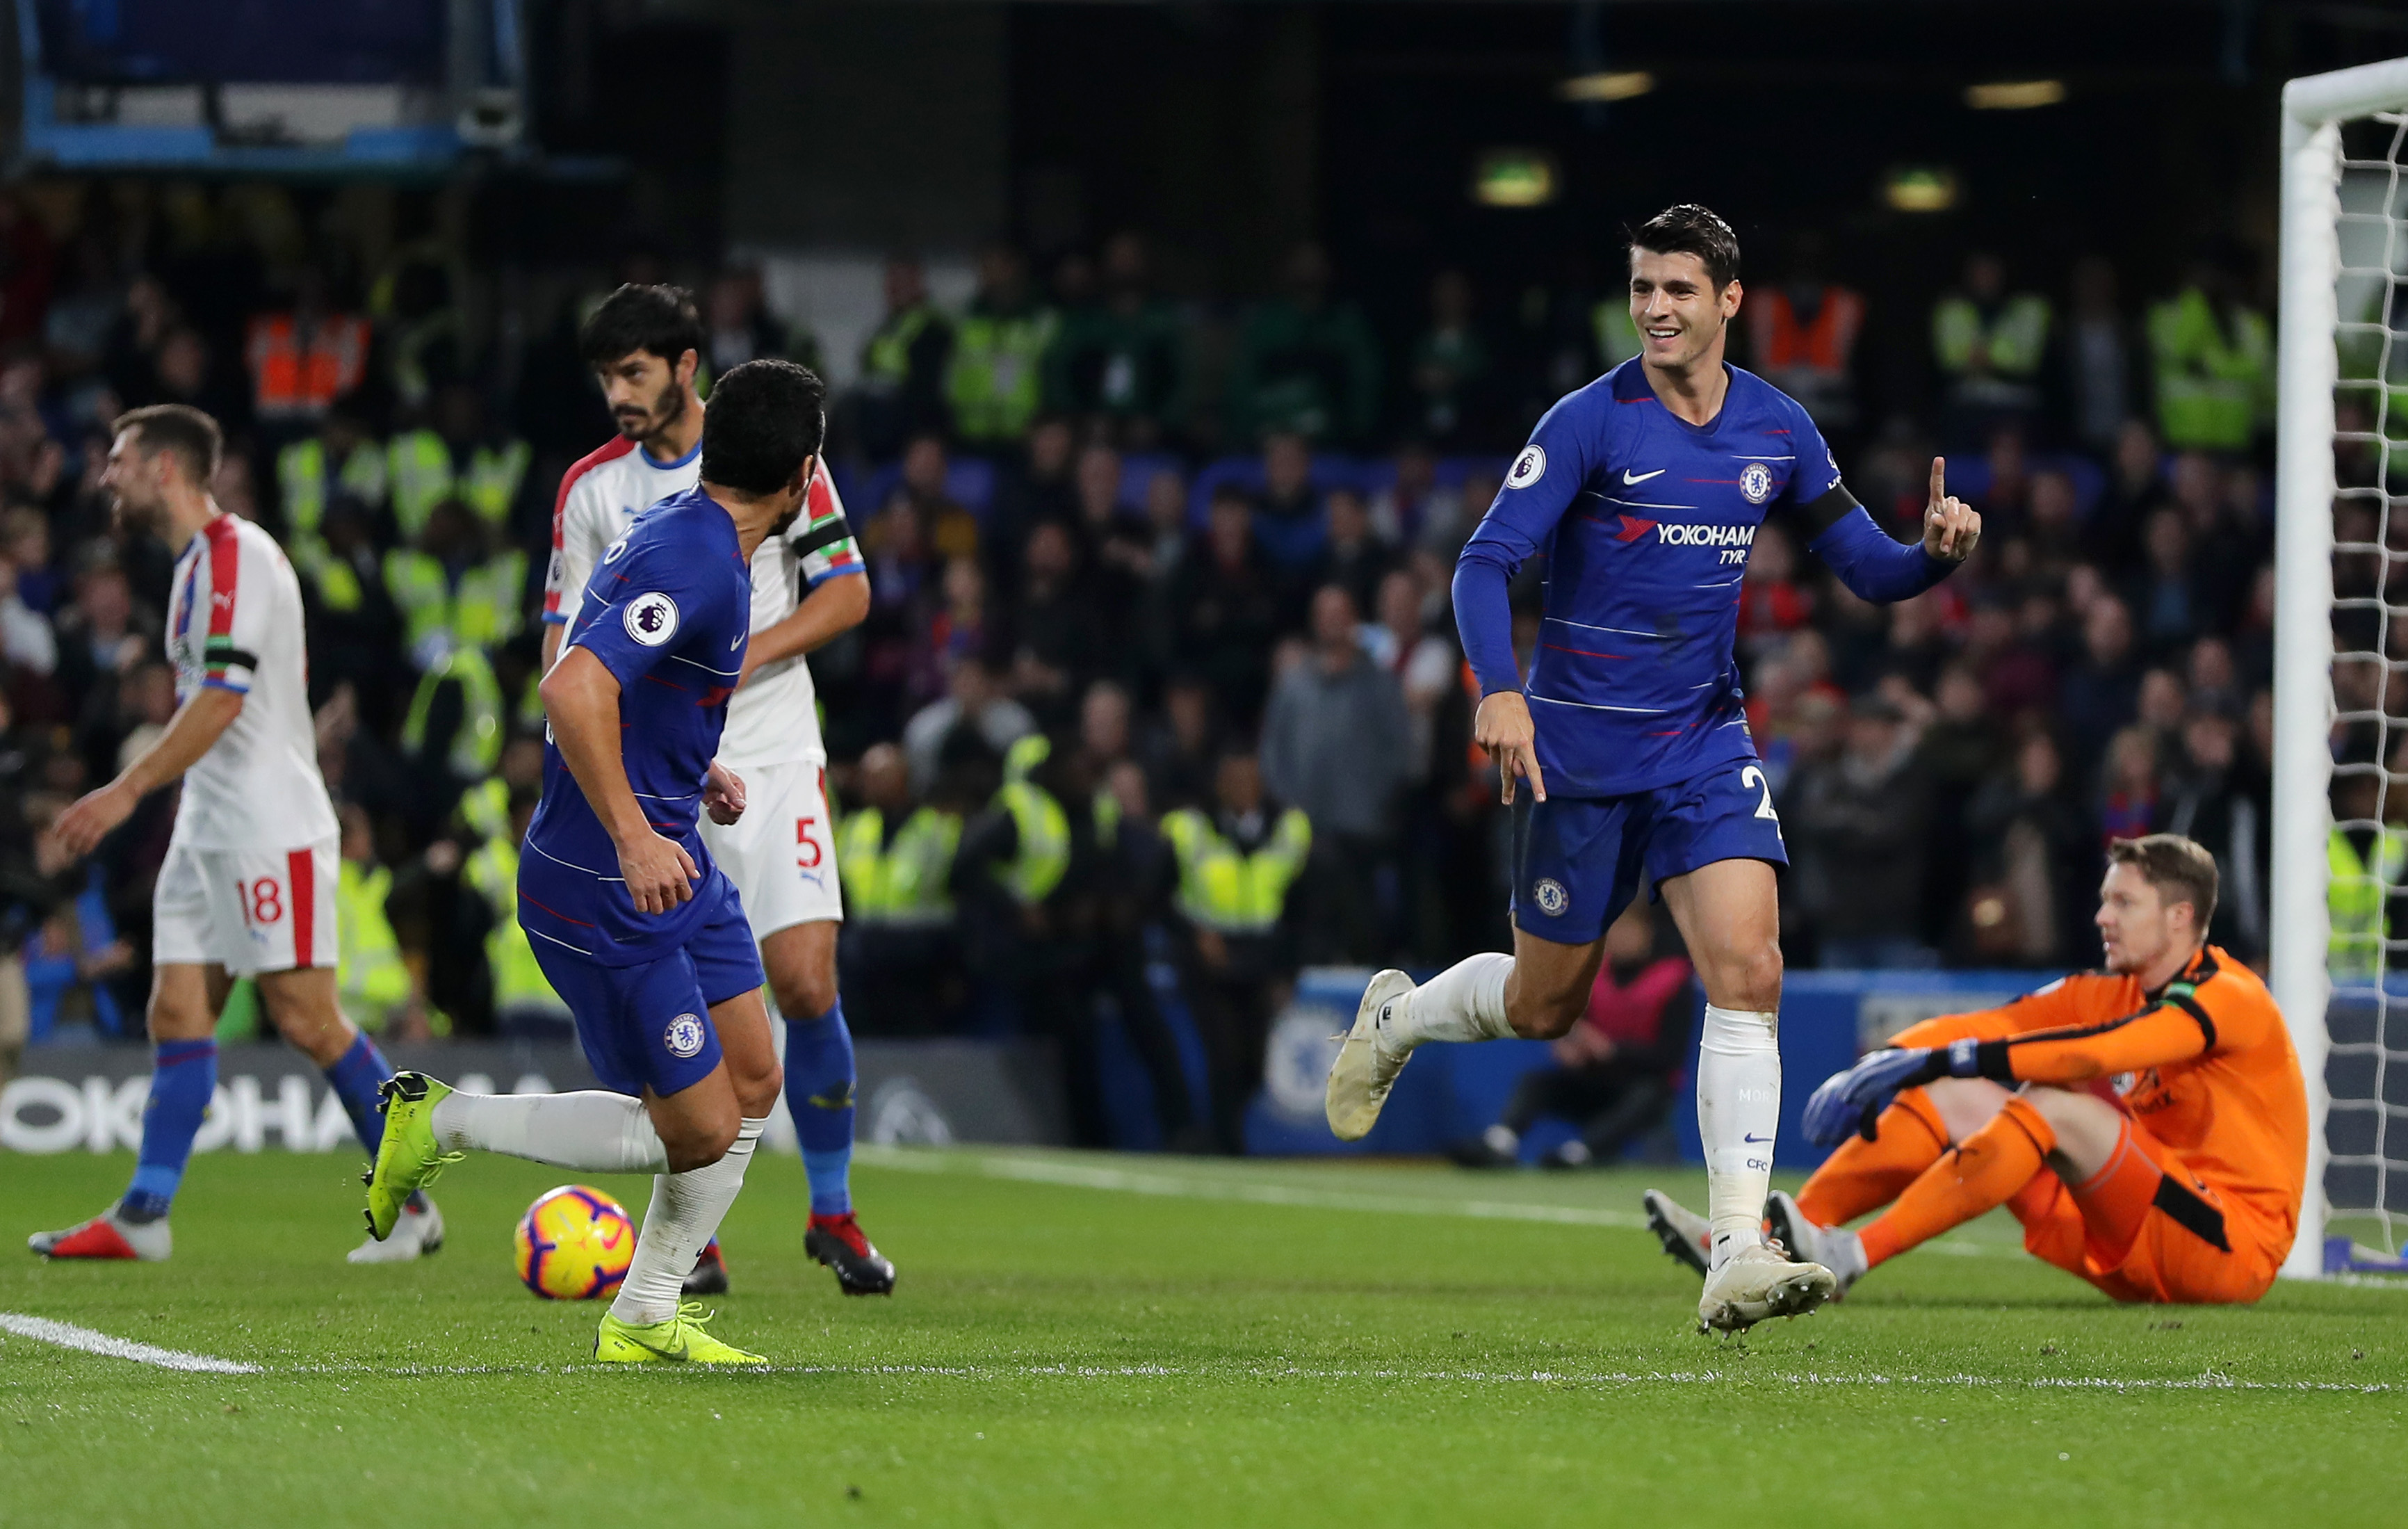 Chelsea's Higuaín deal waiting on Morata waiting on Piatek waiting on Kalinic — reports